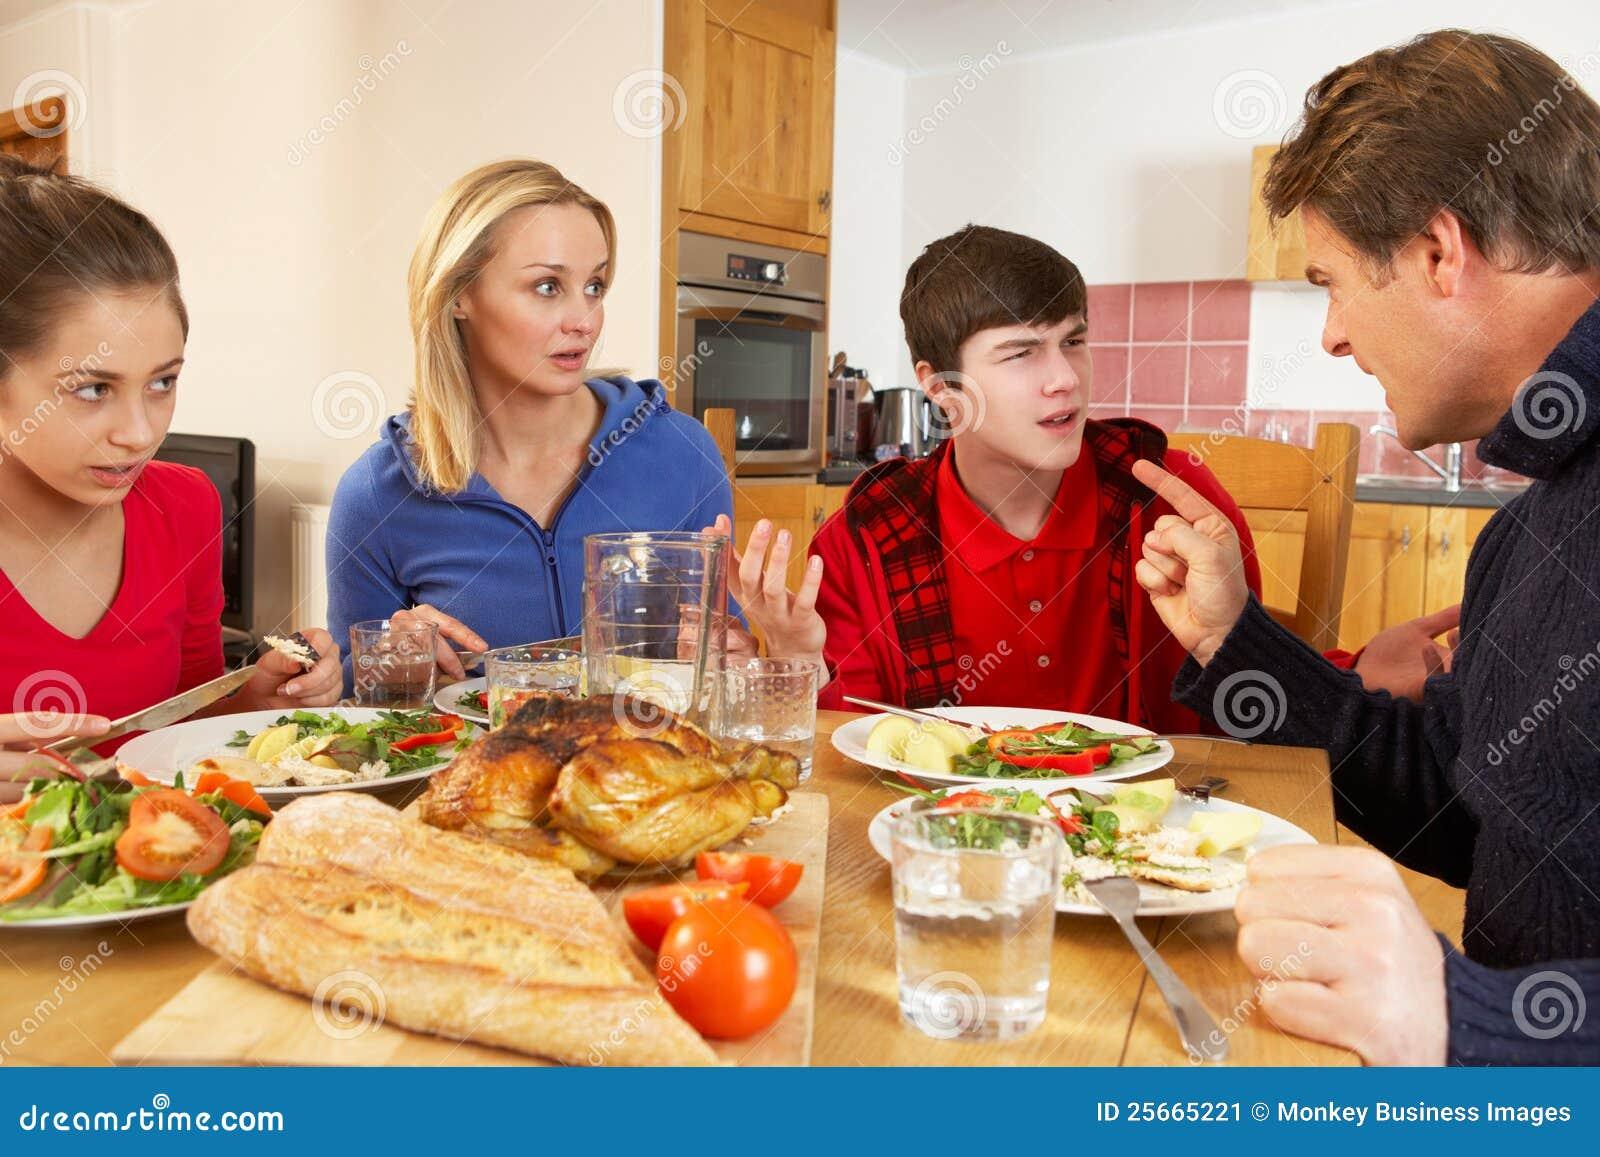 A family argument